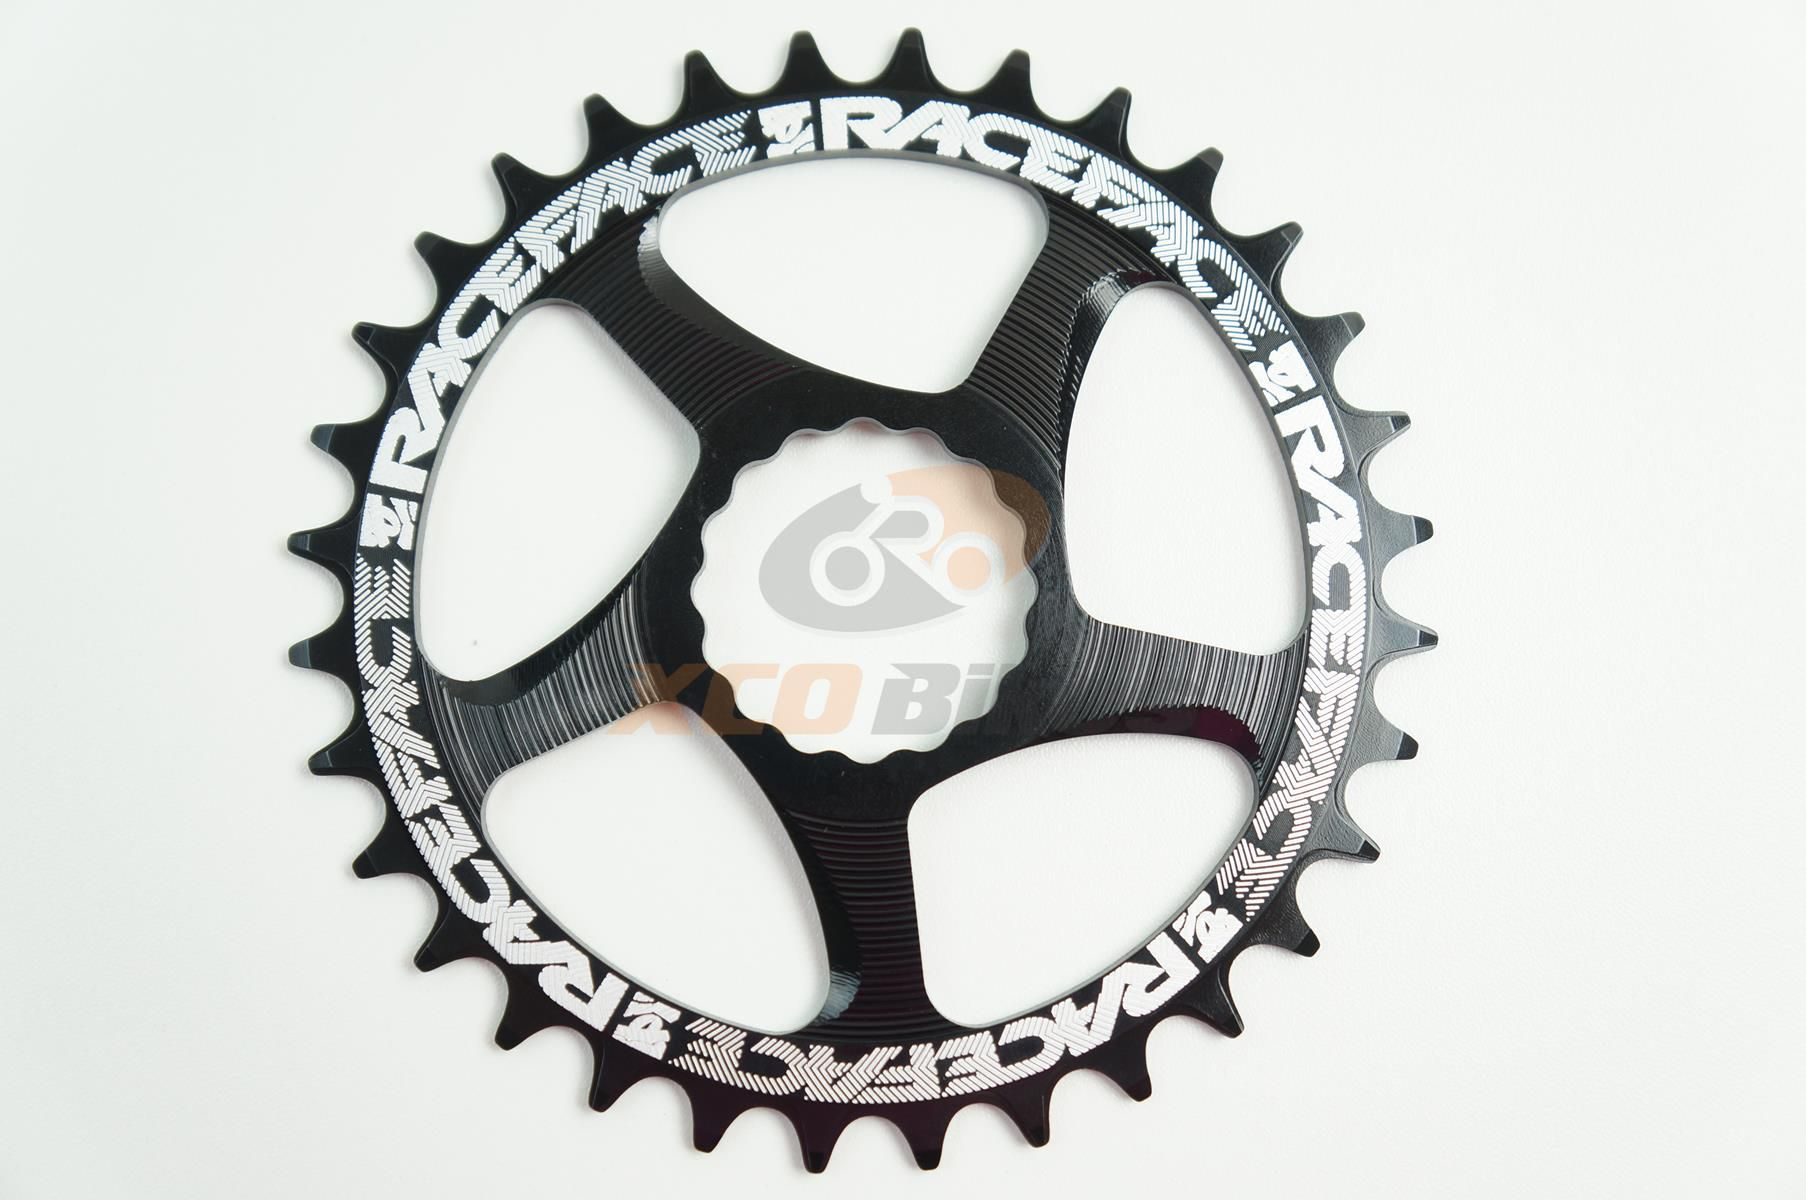 Coroa Bicicleta Race Face 32t Direct Mount Cinch 3mm Off Set Boost Para Uso 1x11 1x12